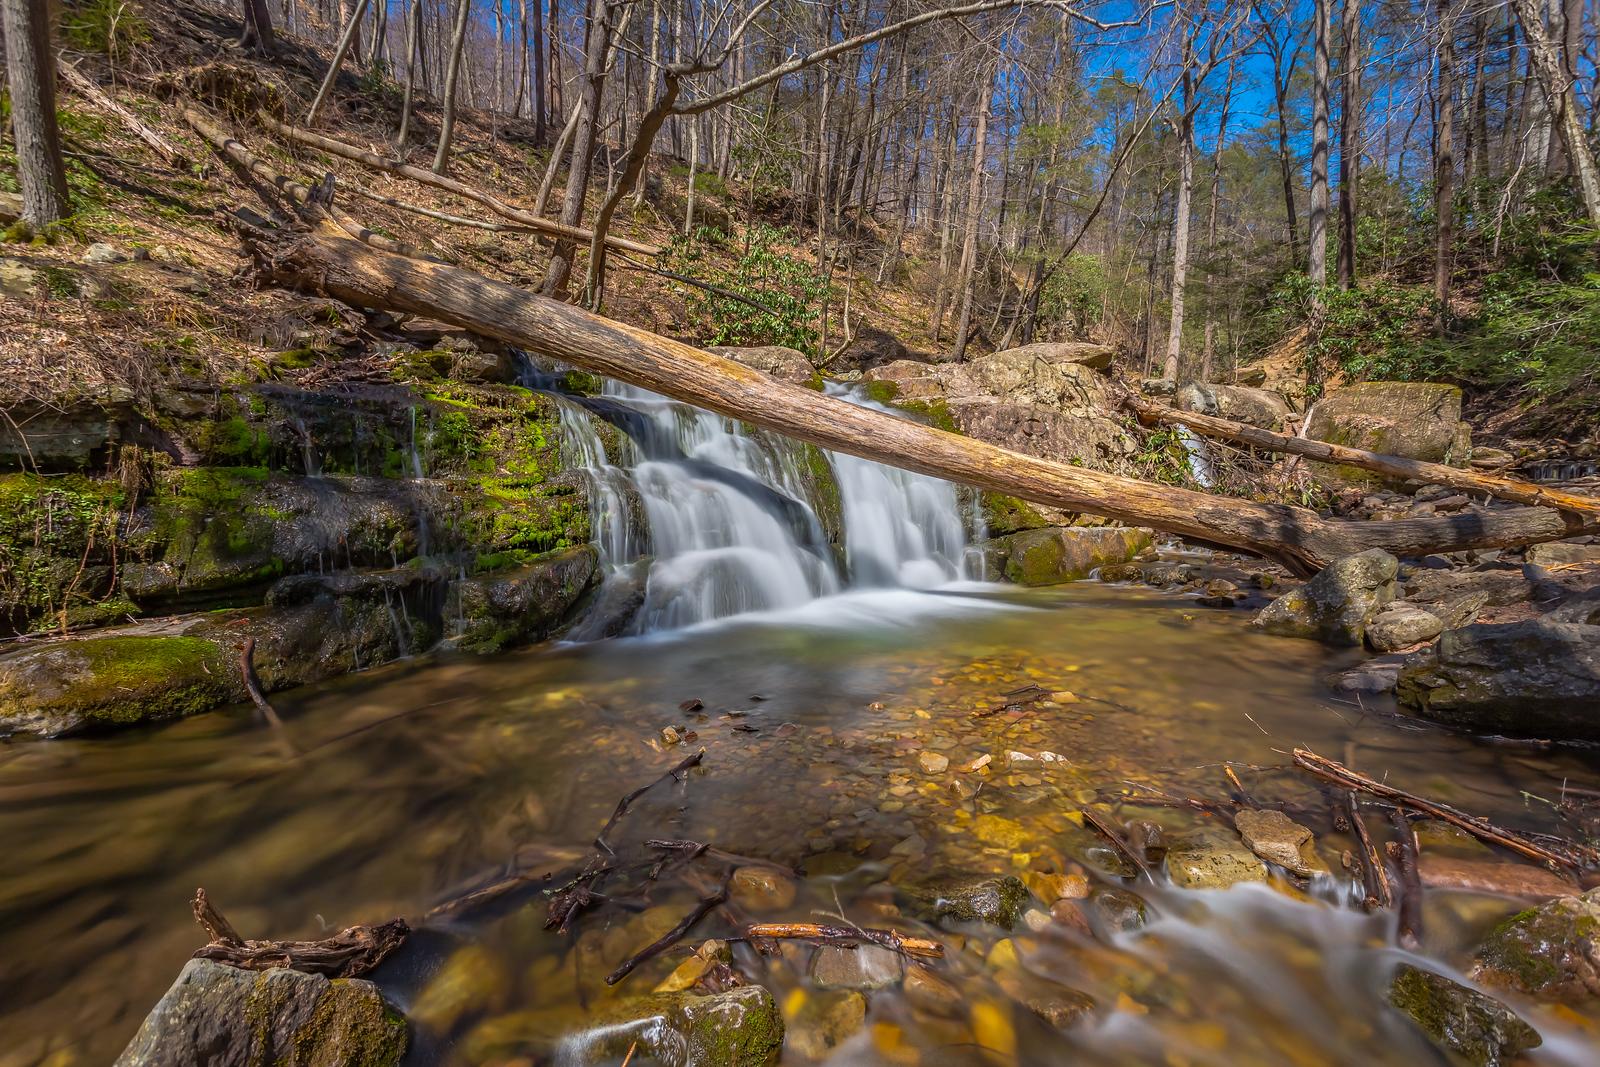 Falls on Dunnfield Creek